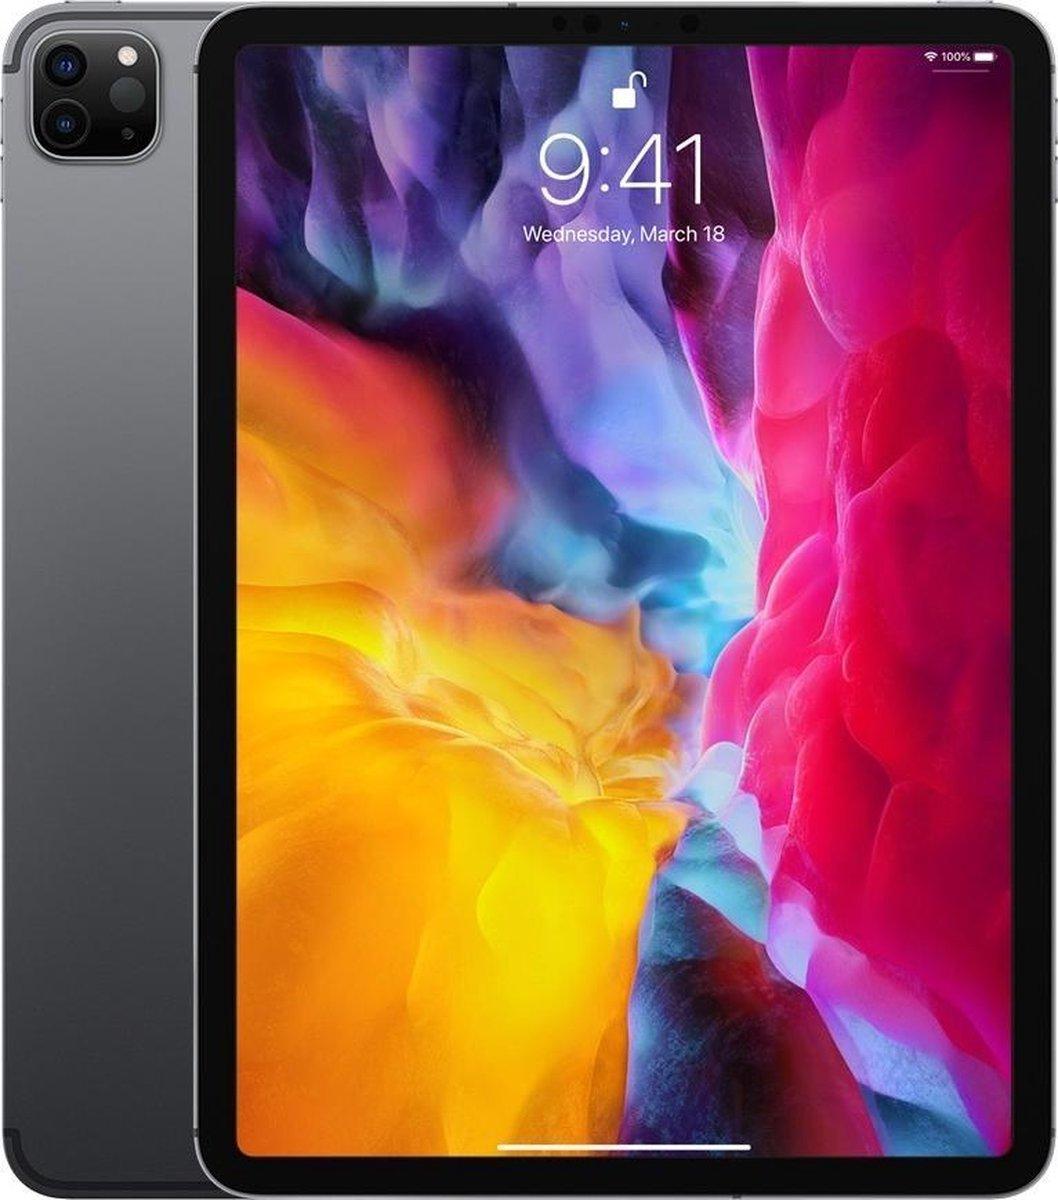 Apple iPad Pro (2020) - 11 inch - WiFi + 4G - 256GB - Spacegrijs